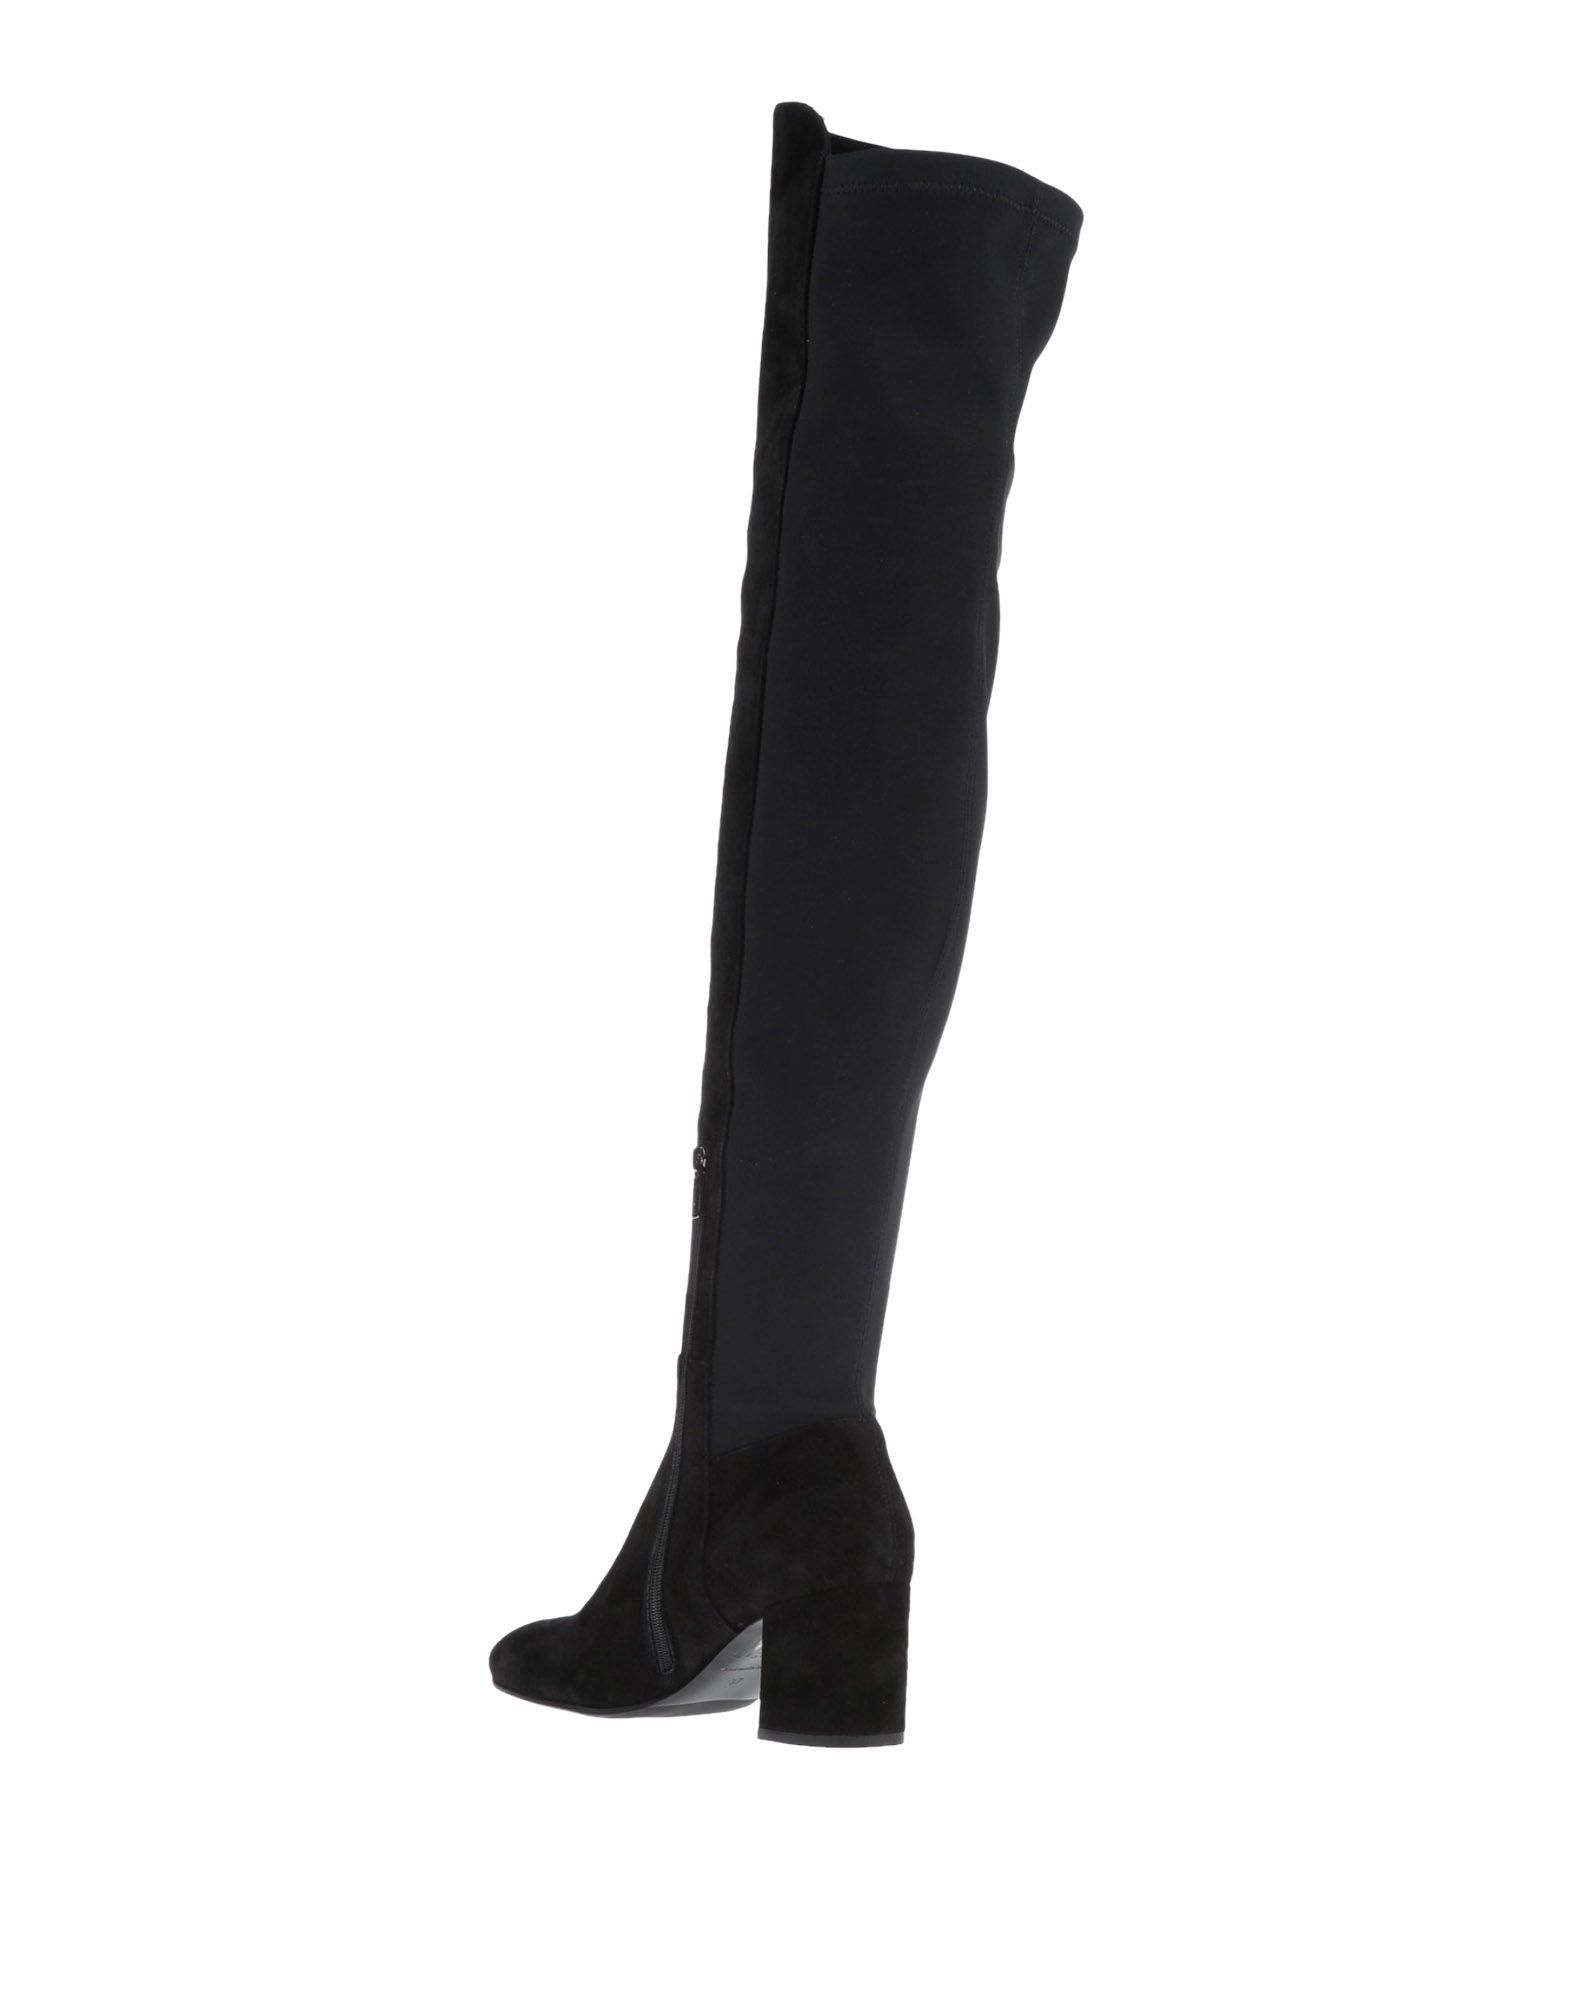 FOOTWEAR Le Silla Black Woman Leather